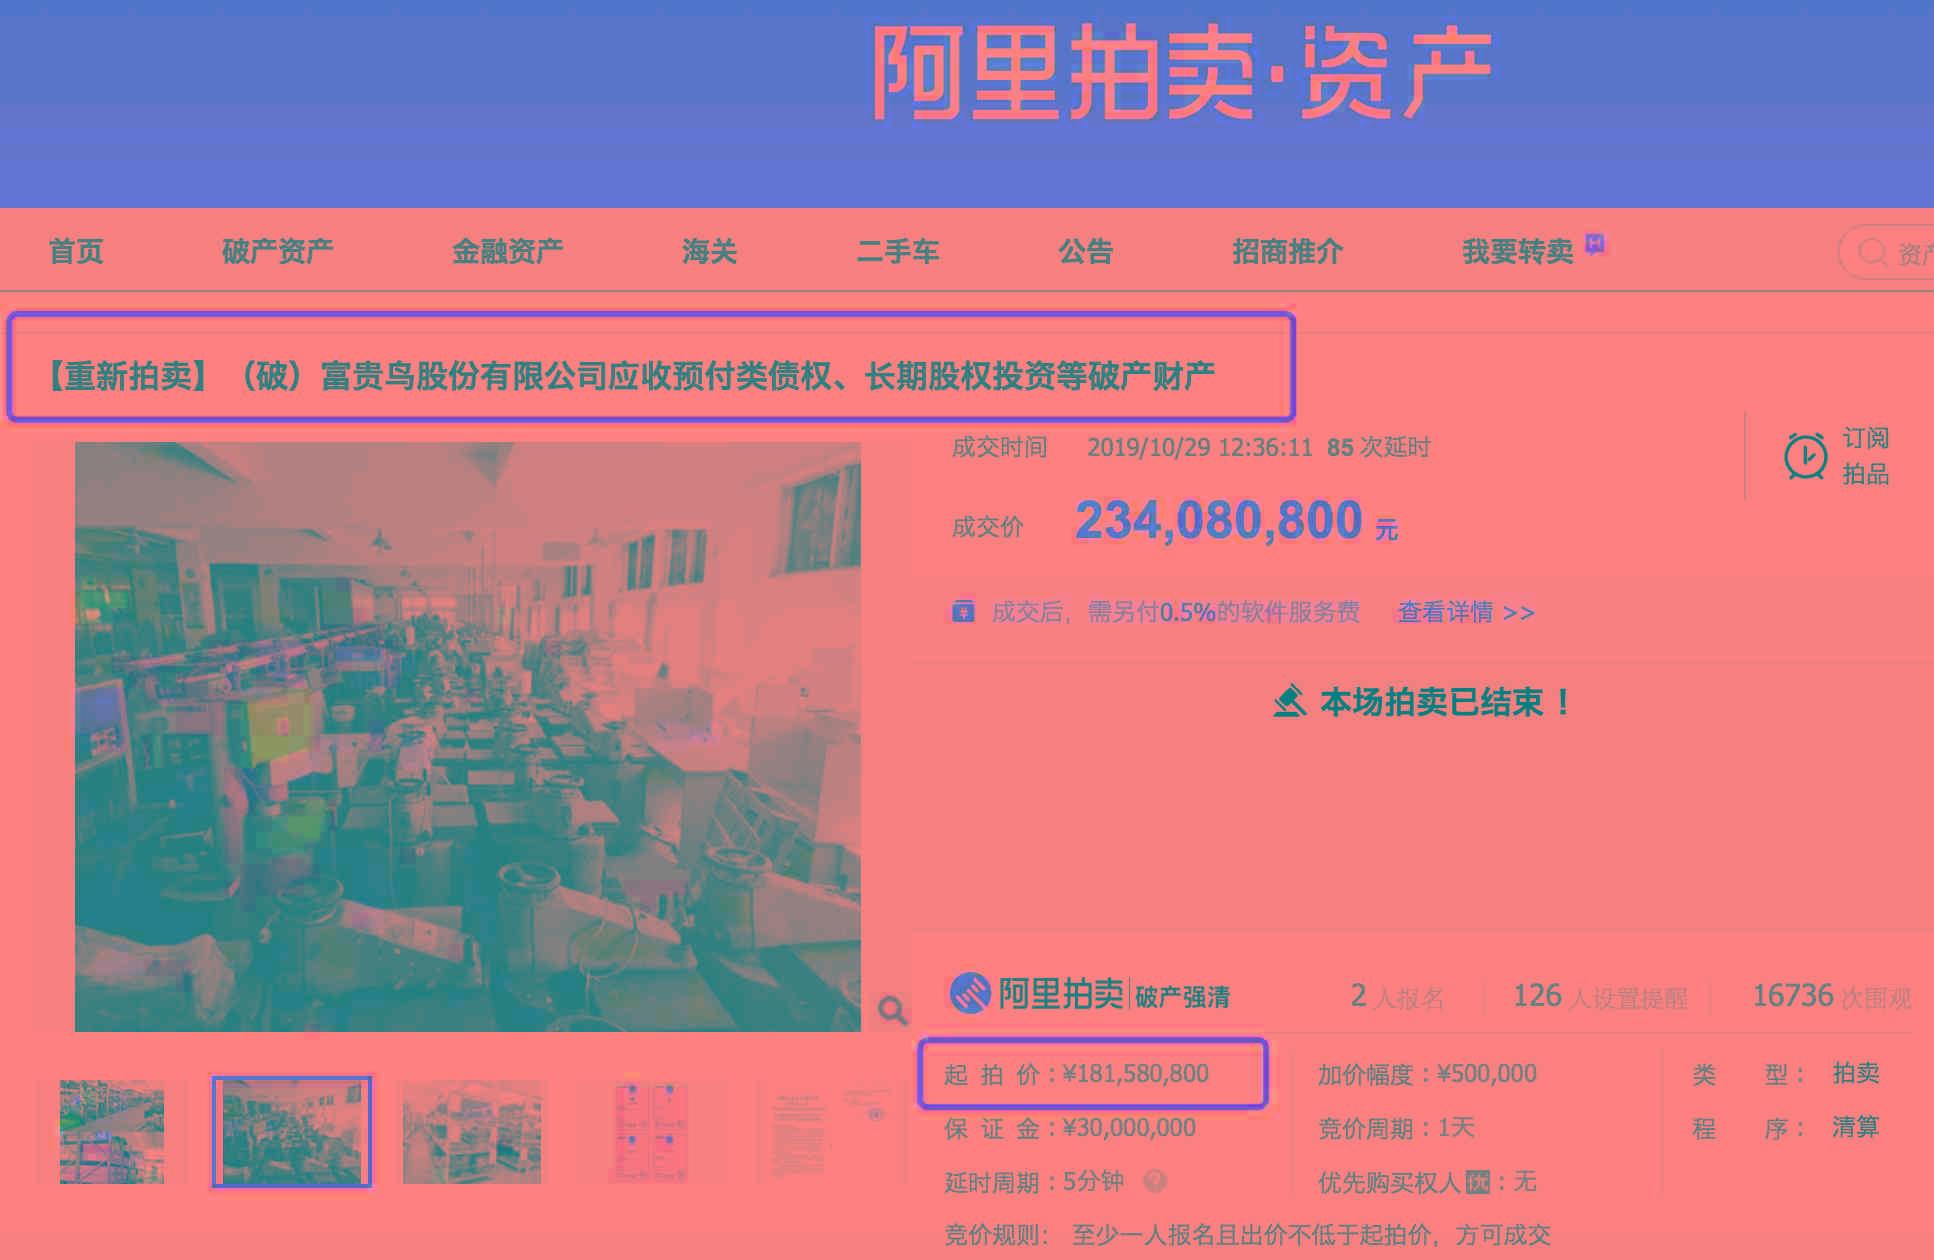 "<b>昔日""鞋王""富贵鸟破产拍卖2.34亿成交 曾两度流拍</b>"